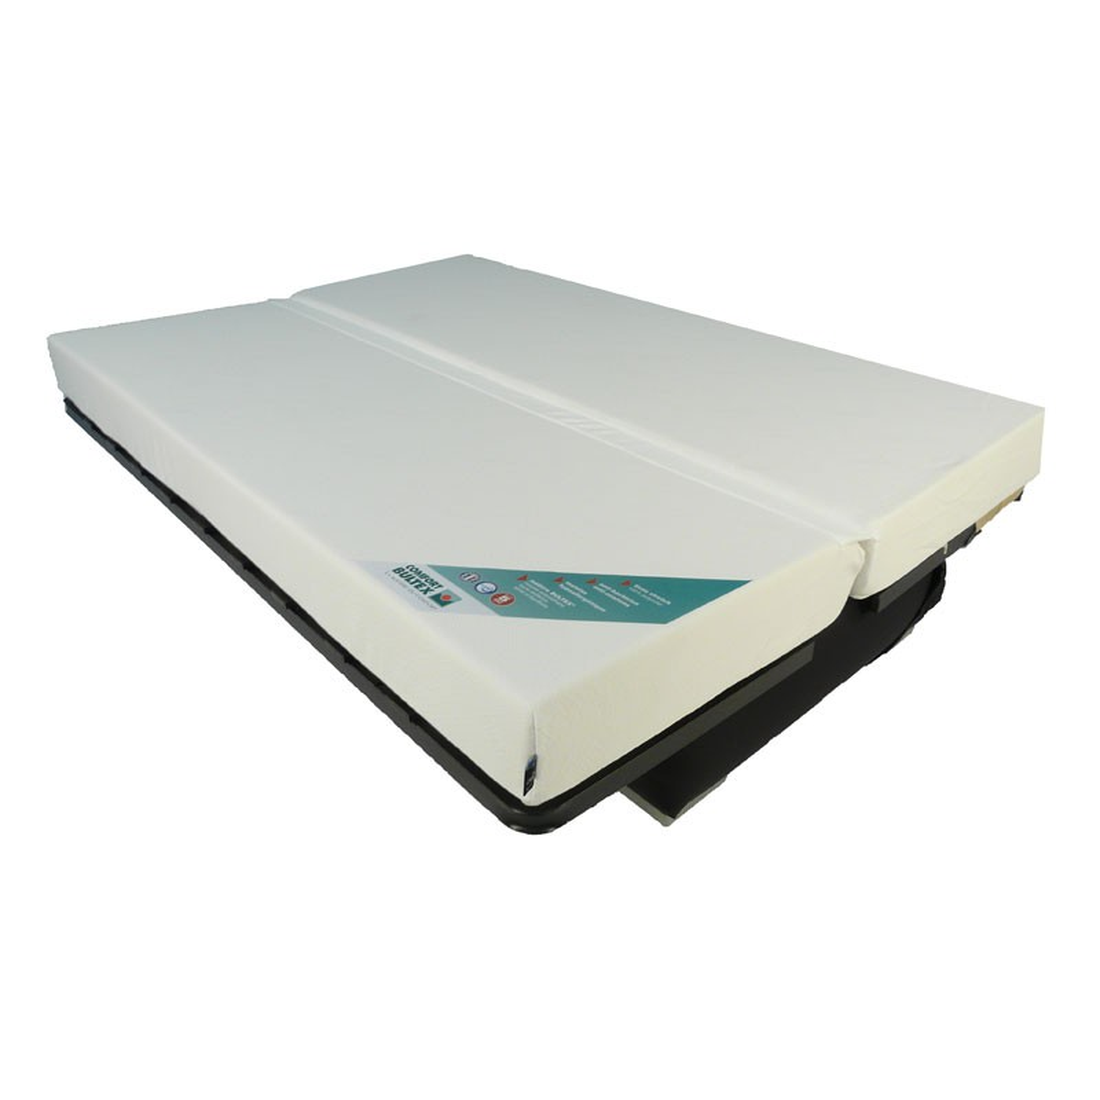 banquette lit clic clac gris blanc matelas bultex 130cm speed bria n 1. Black Bedroom Furniture Sets. Home Design Ideas